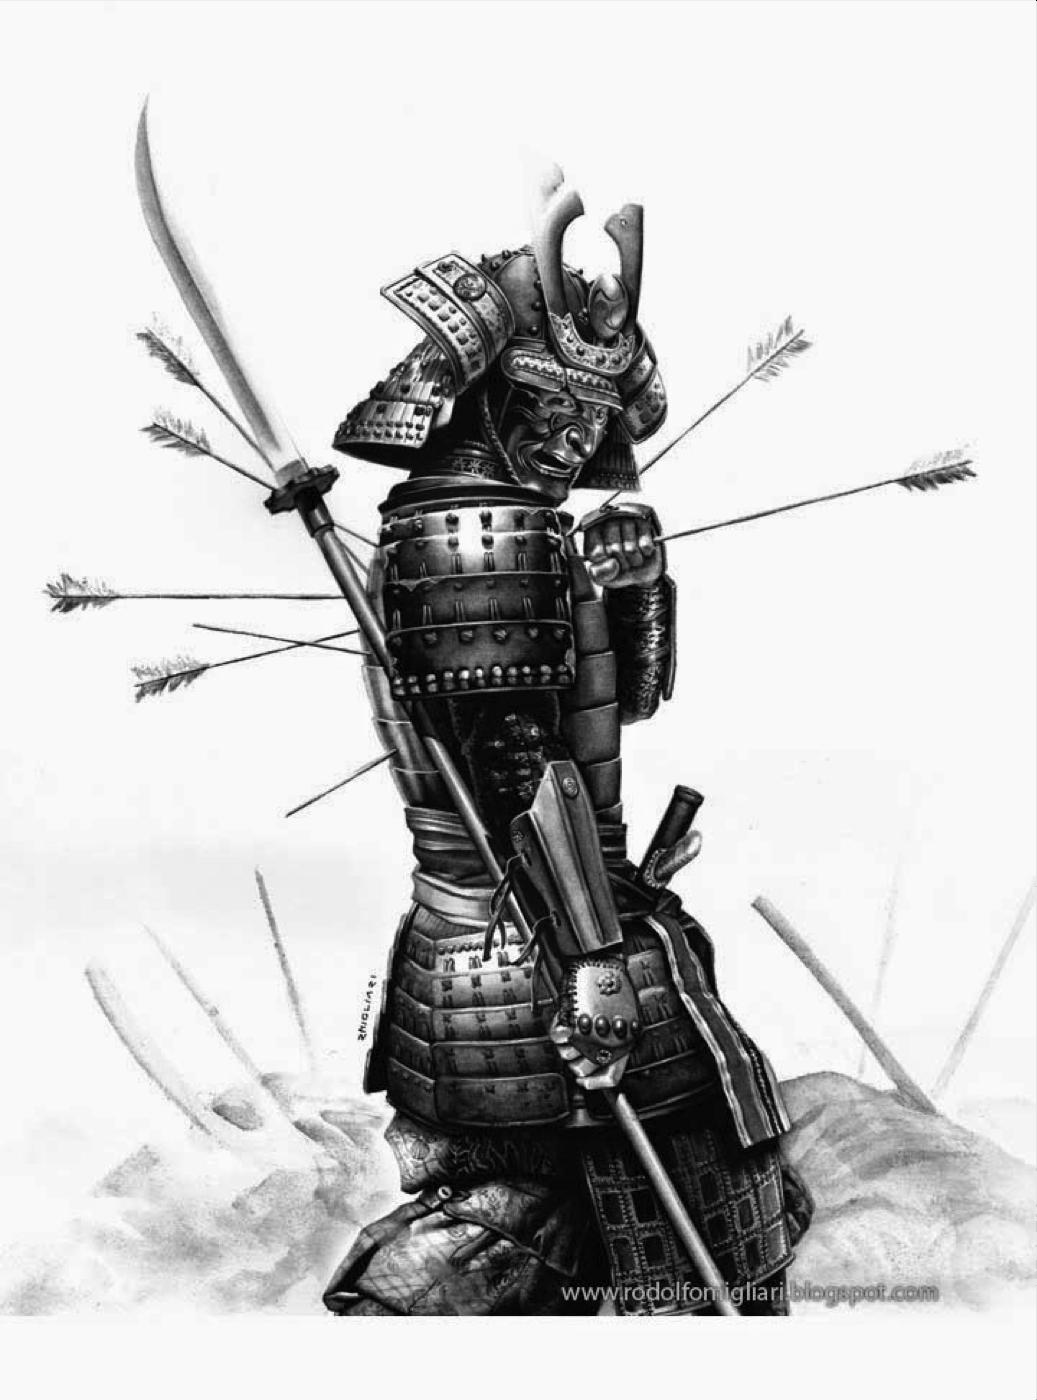 Pin by Freddy Lopez on Samurai Art | Pinterest | Samurai, Tattoo and ...